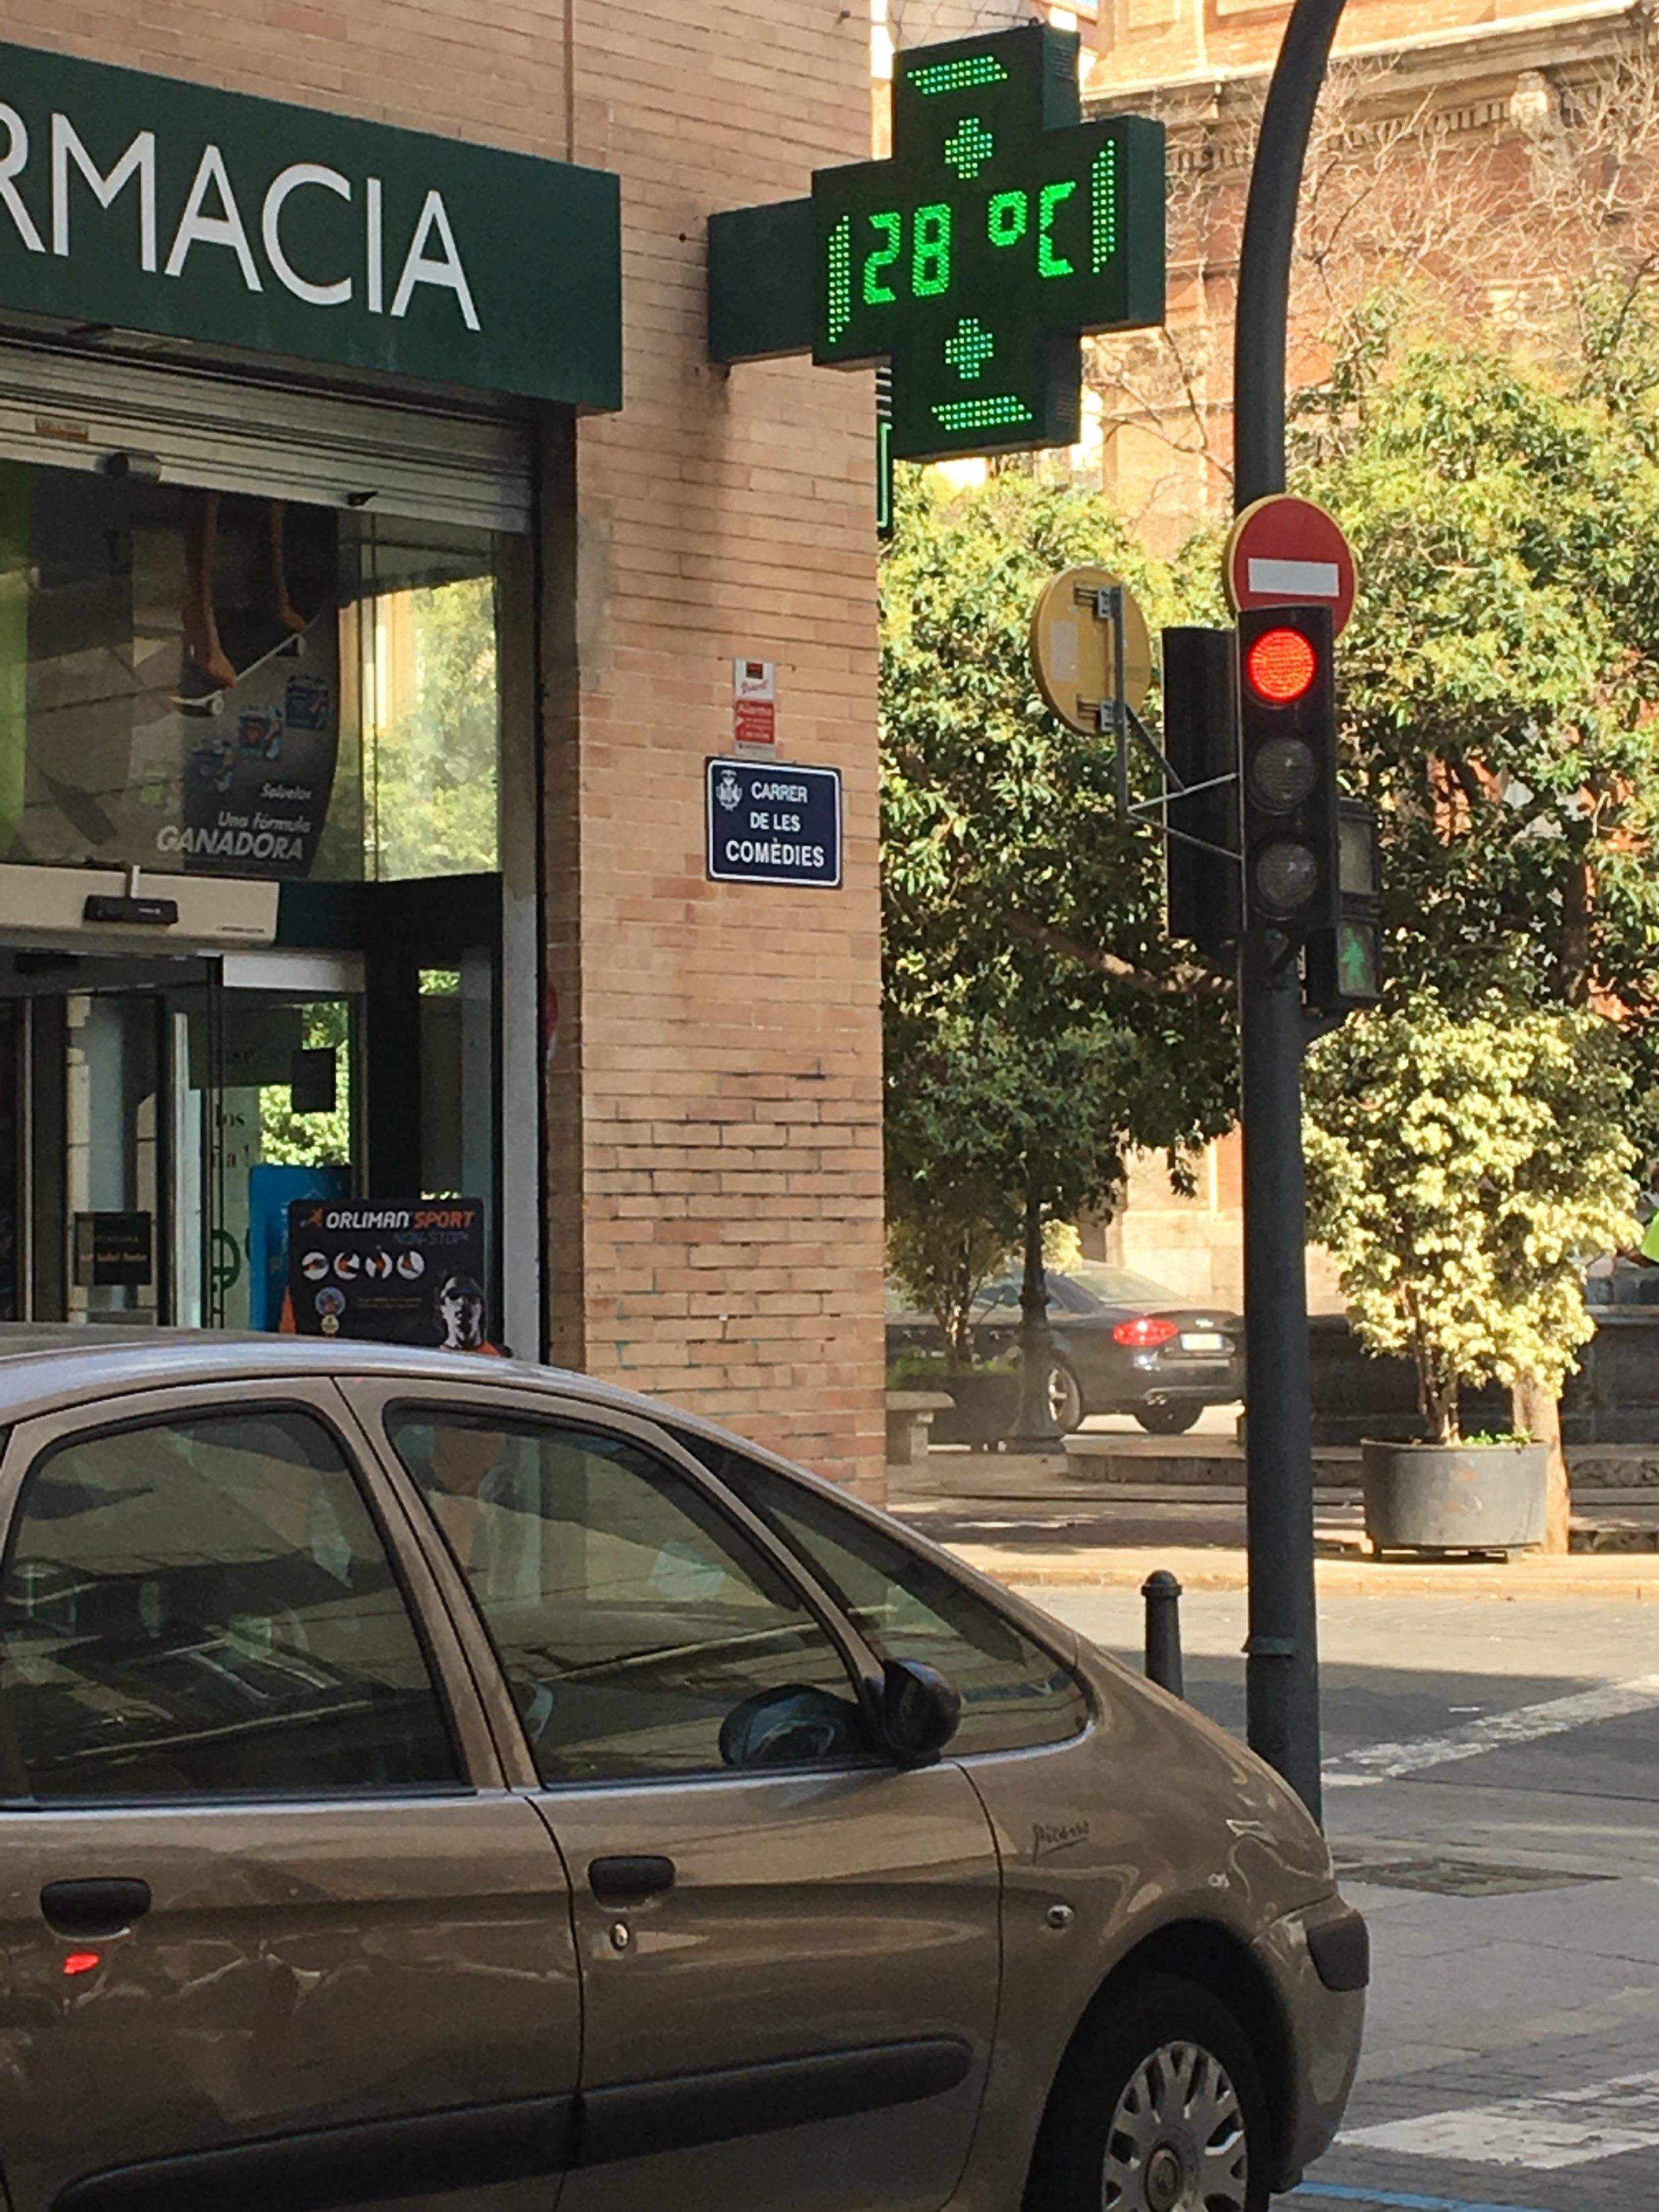 - This shaded digital street display shows Valencia at a balmy 28...